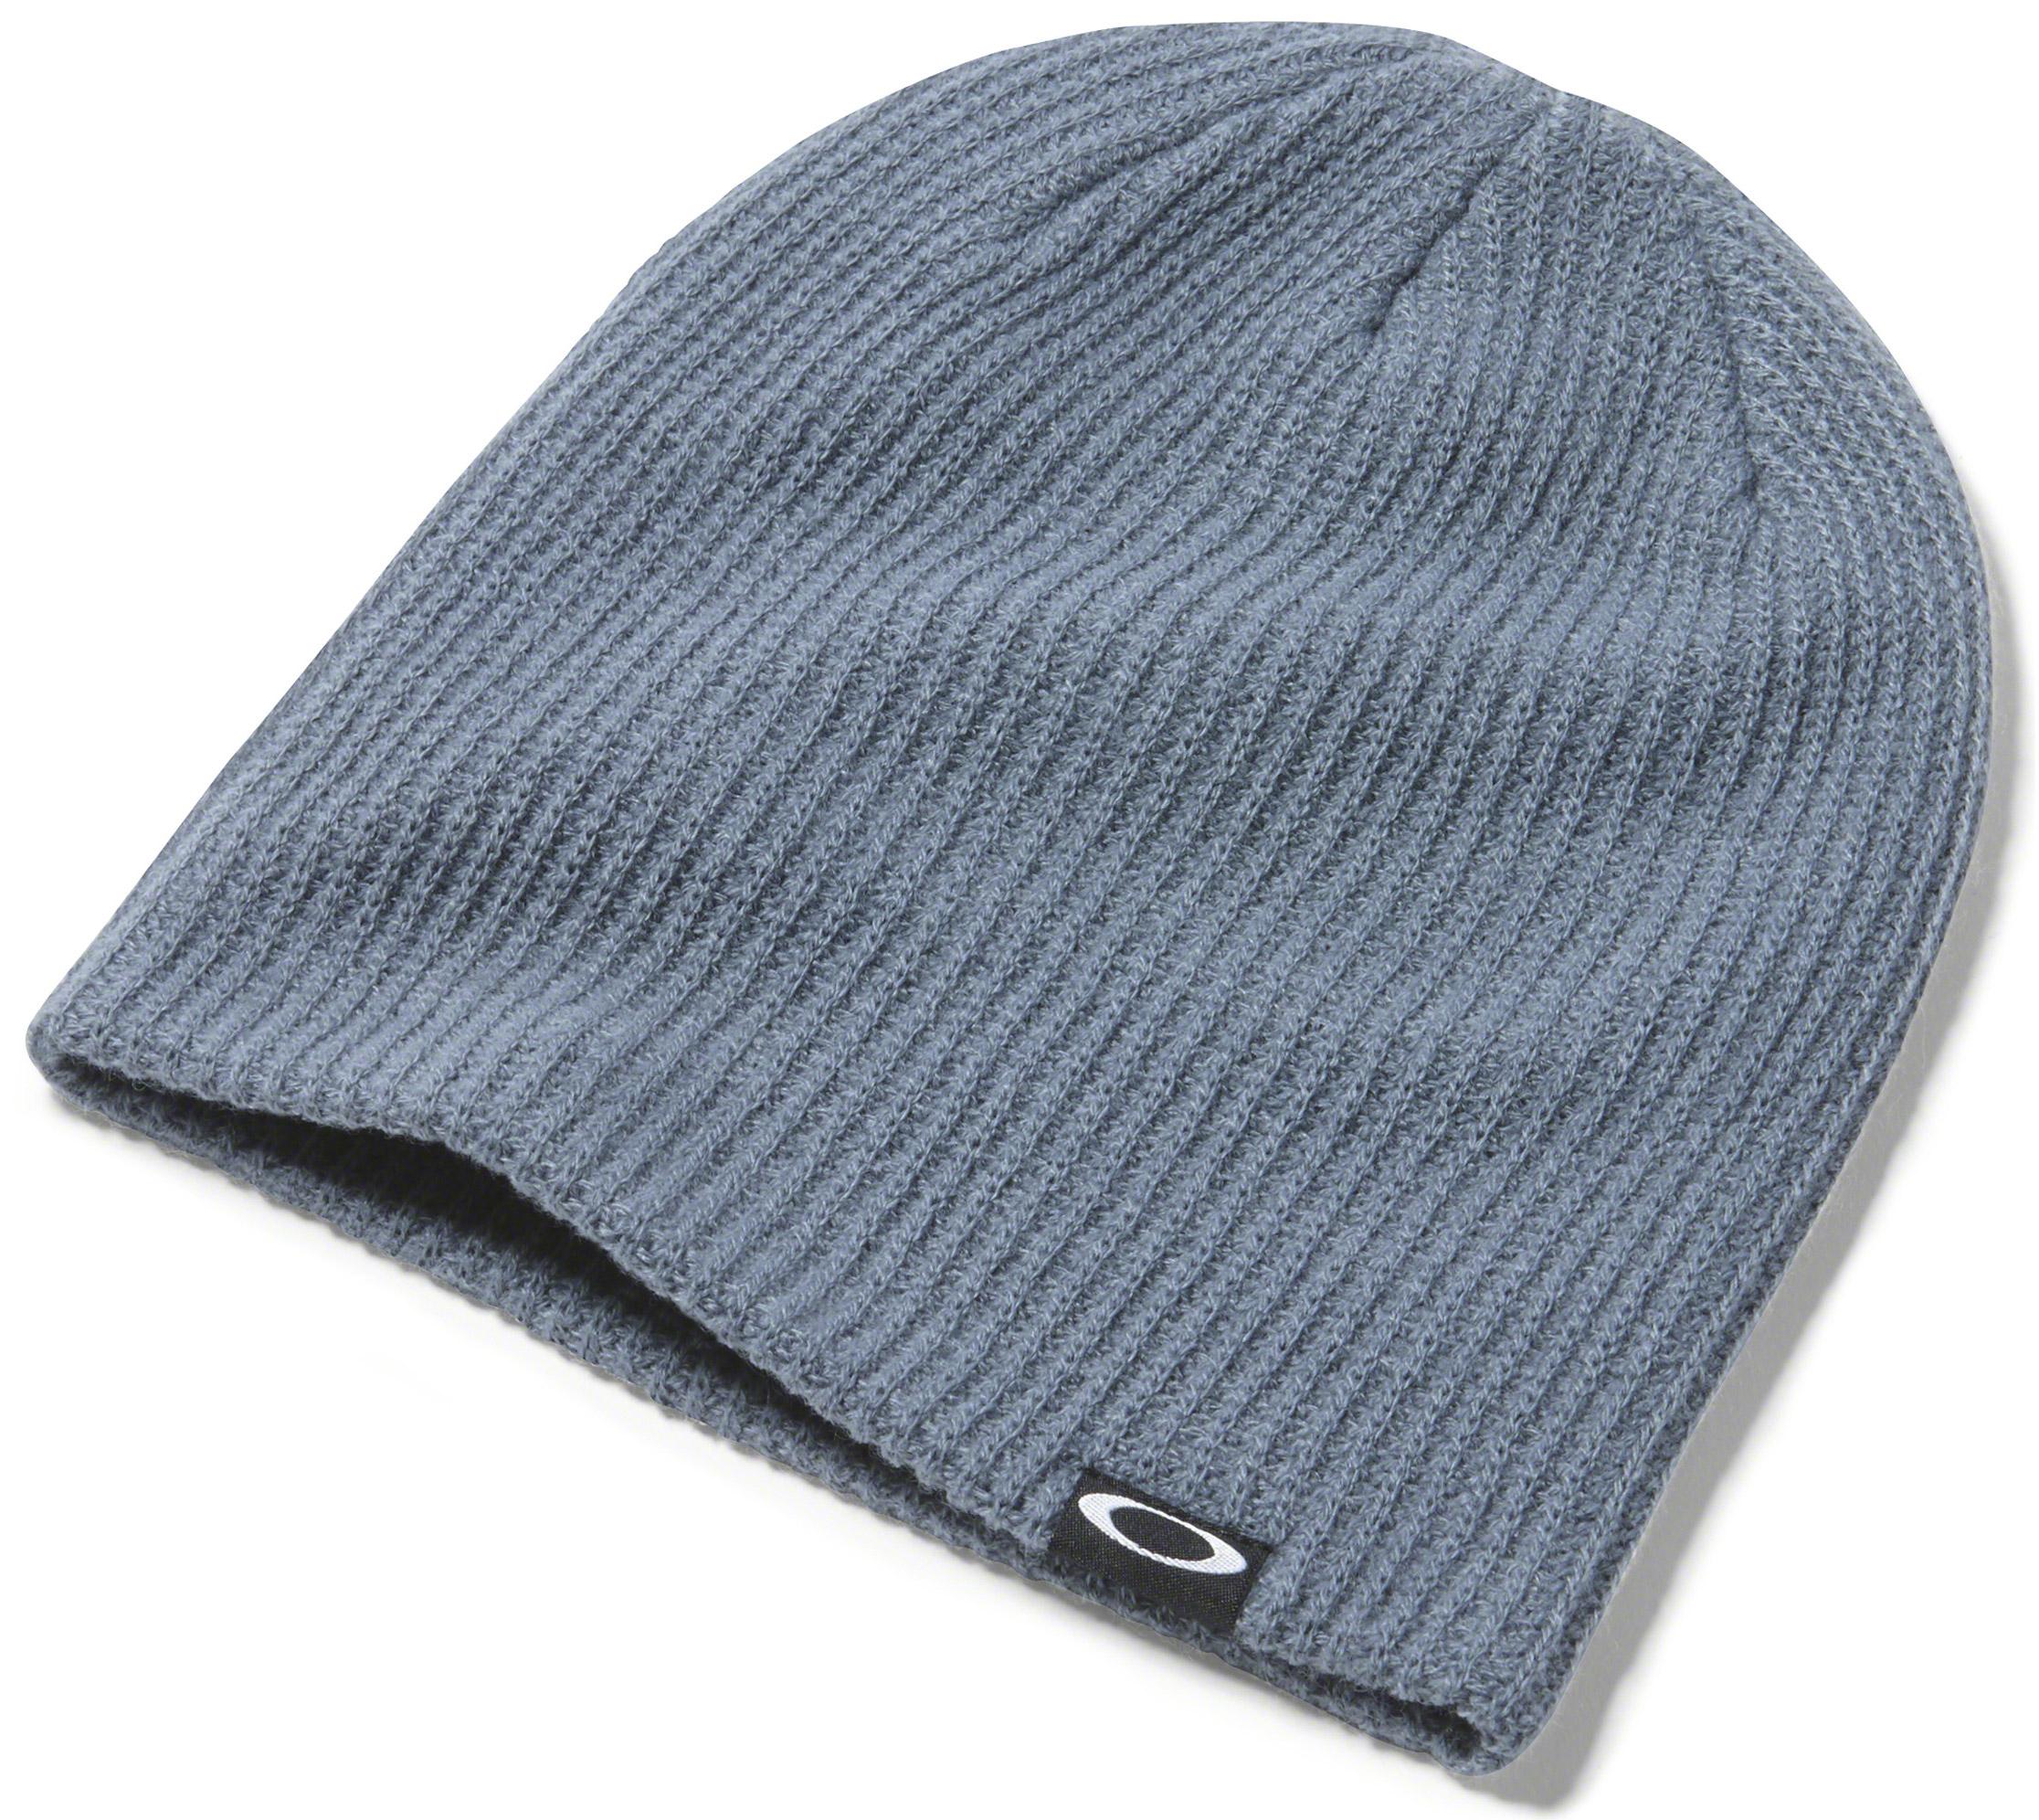 726656f9fd71a Gorro Oakley Fine Knit Beanie « Heritage Malta